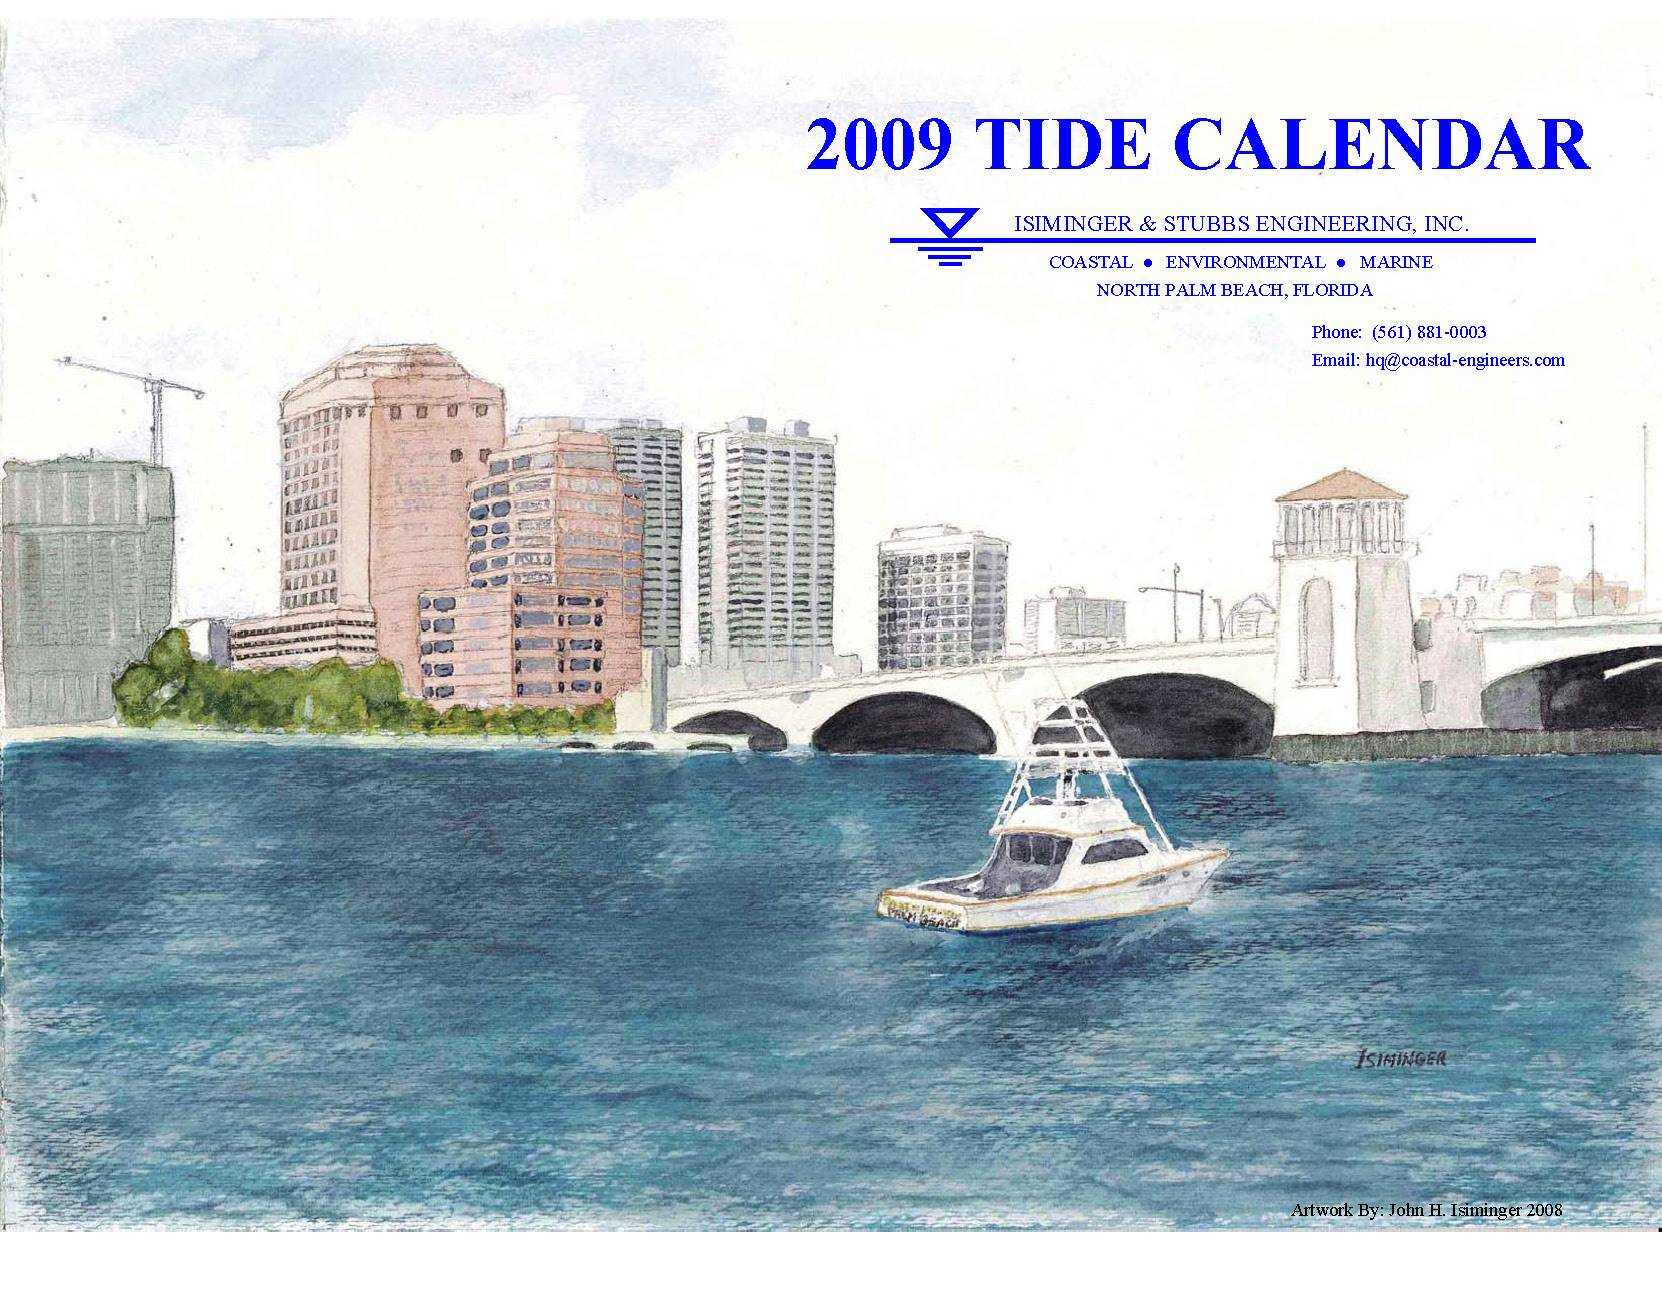 2009 Tide Calendar Cover